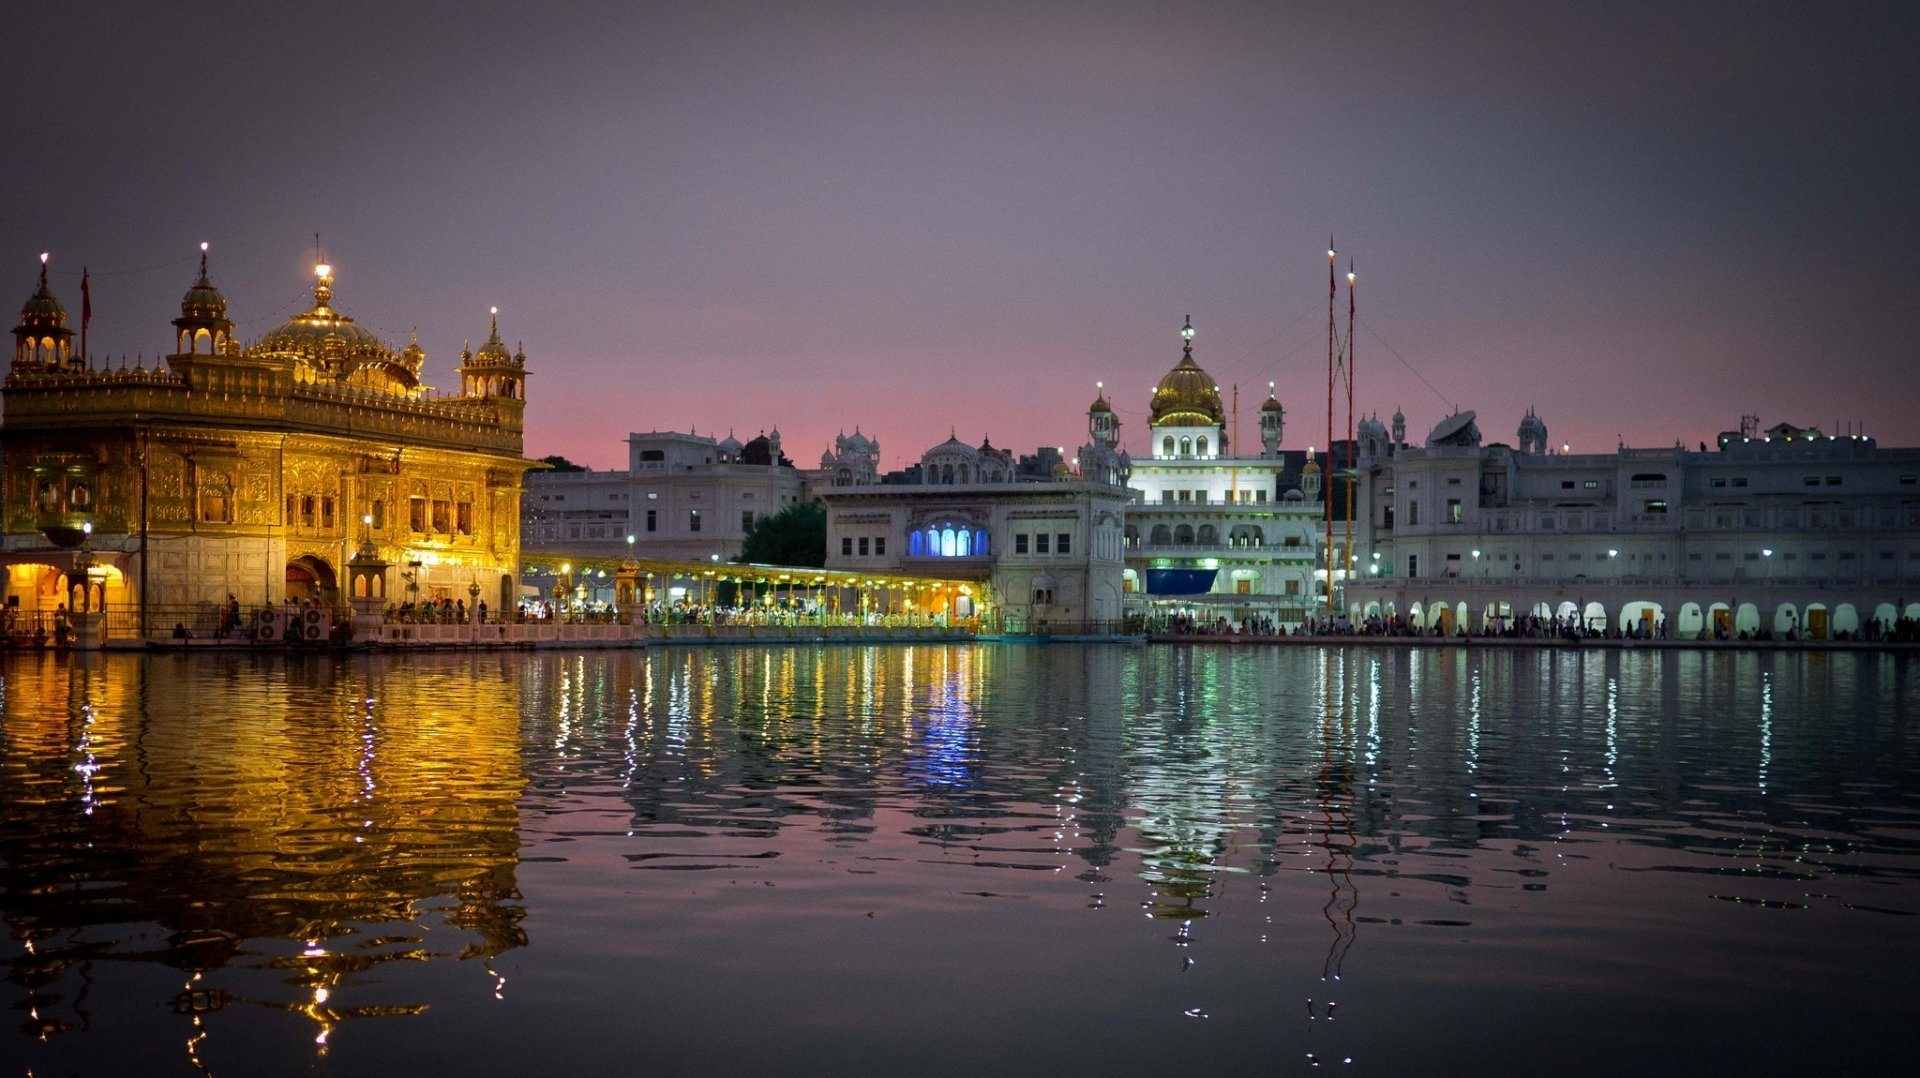 Sikh Wallpapers Hd For Iphone 5 Harmandir Sahib Hd Wallpaper Background Image